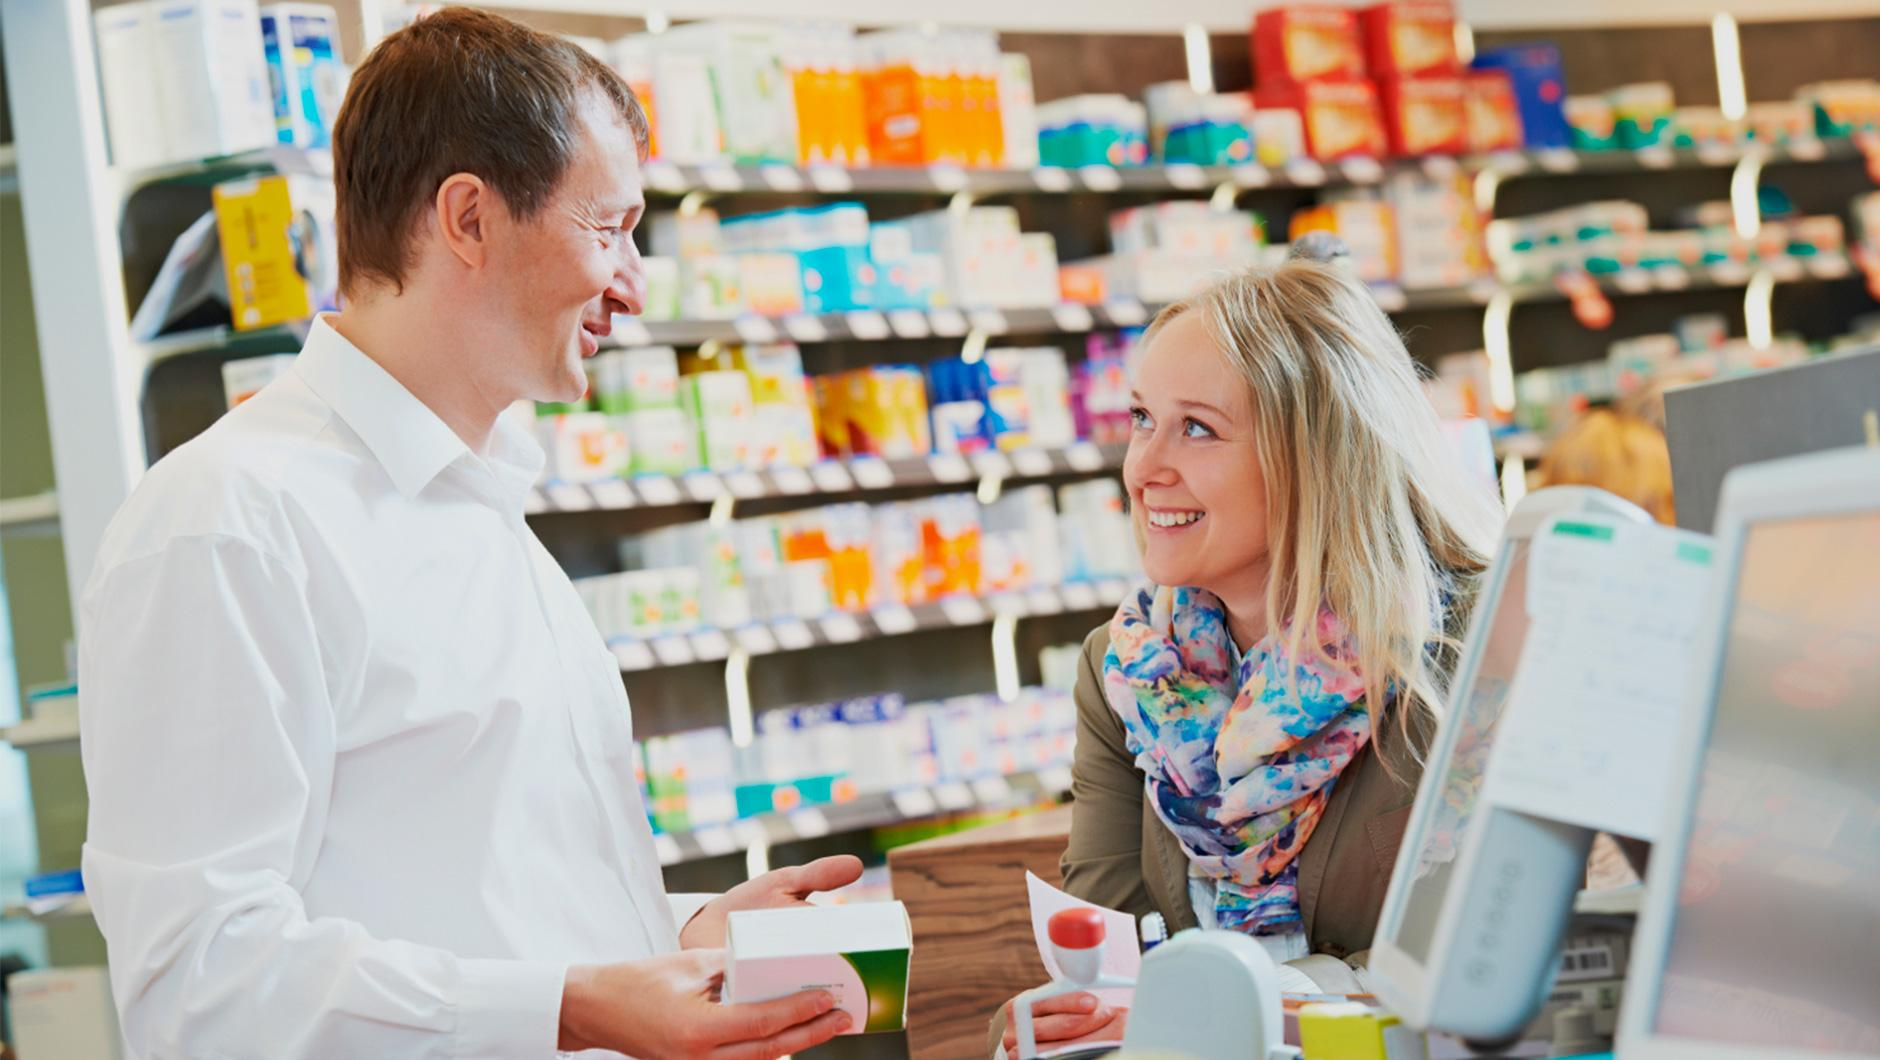 пациенты доверяют фармацевтам больше, чем врачам